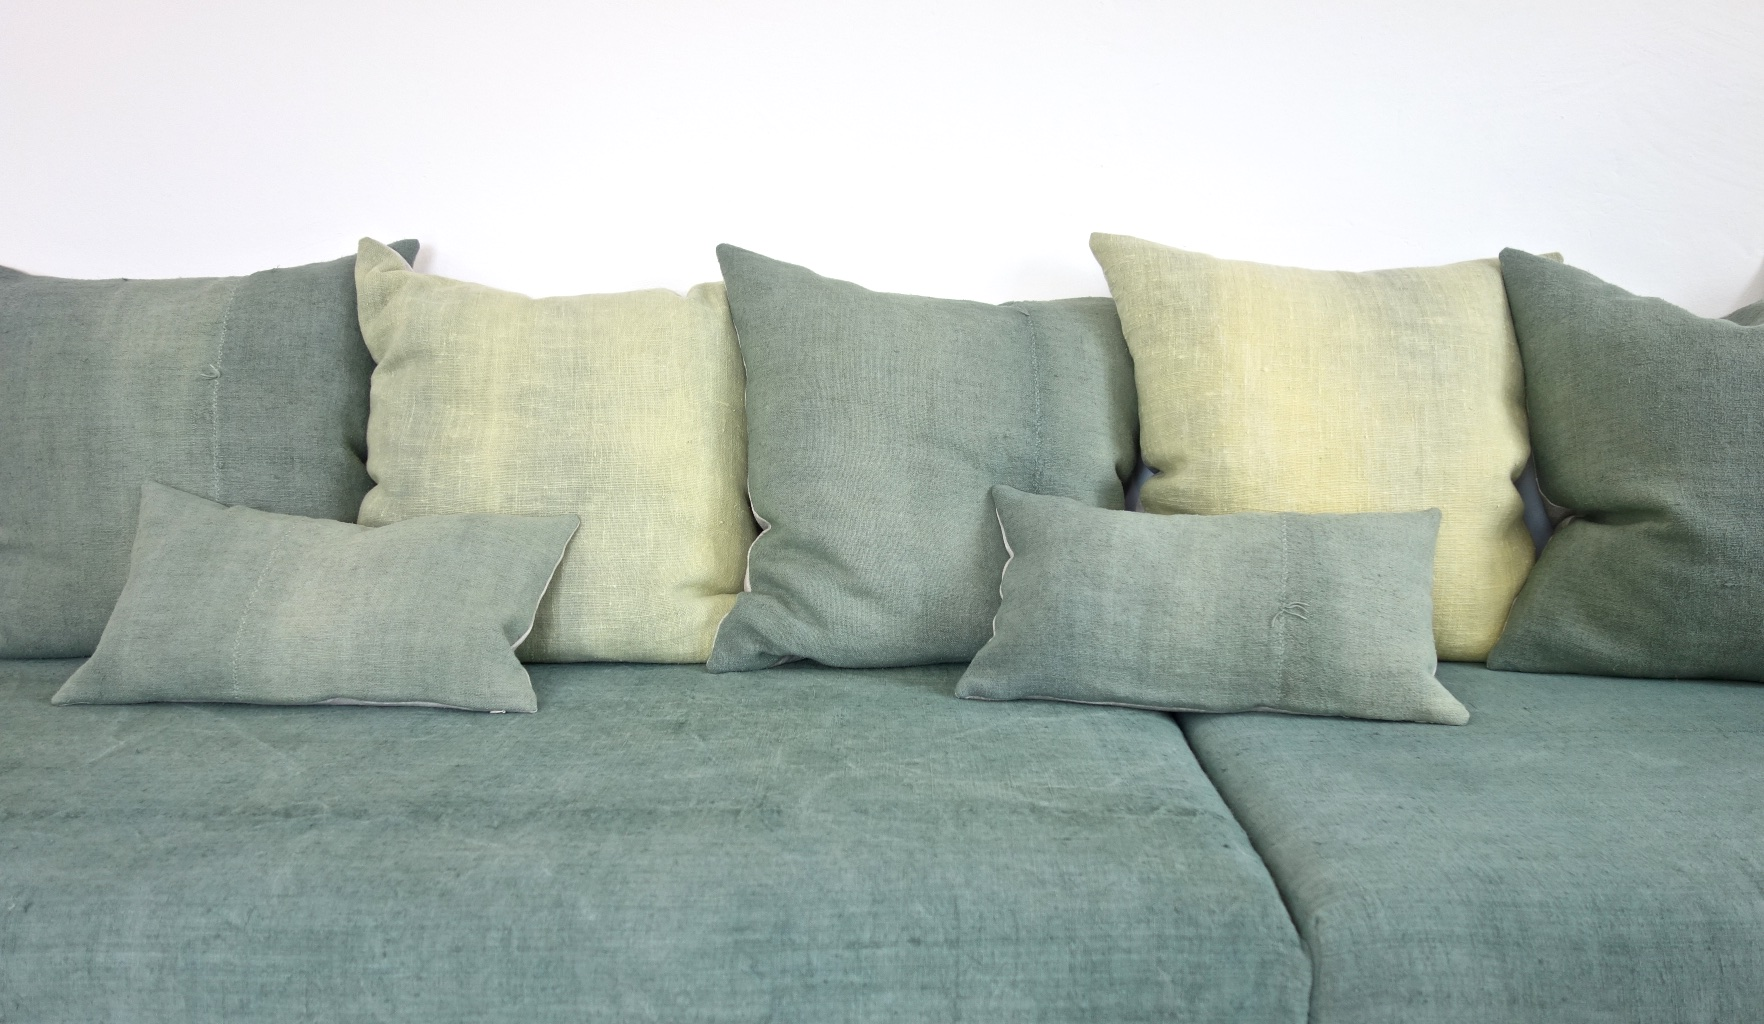 espanyolet_couch_vintage_linen_corner_green4.jpg